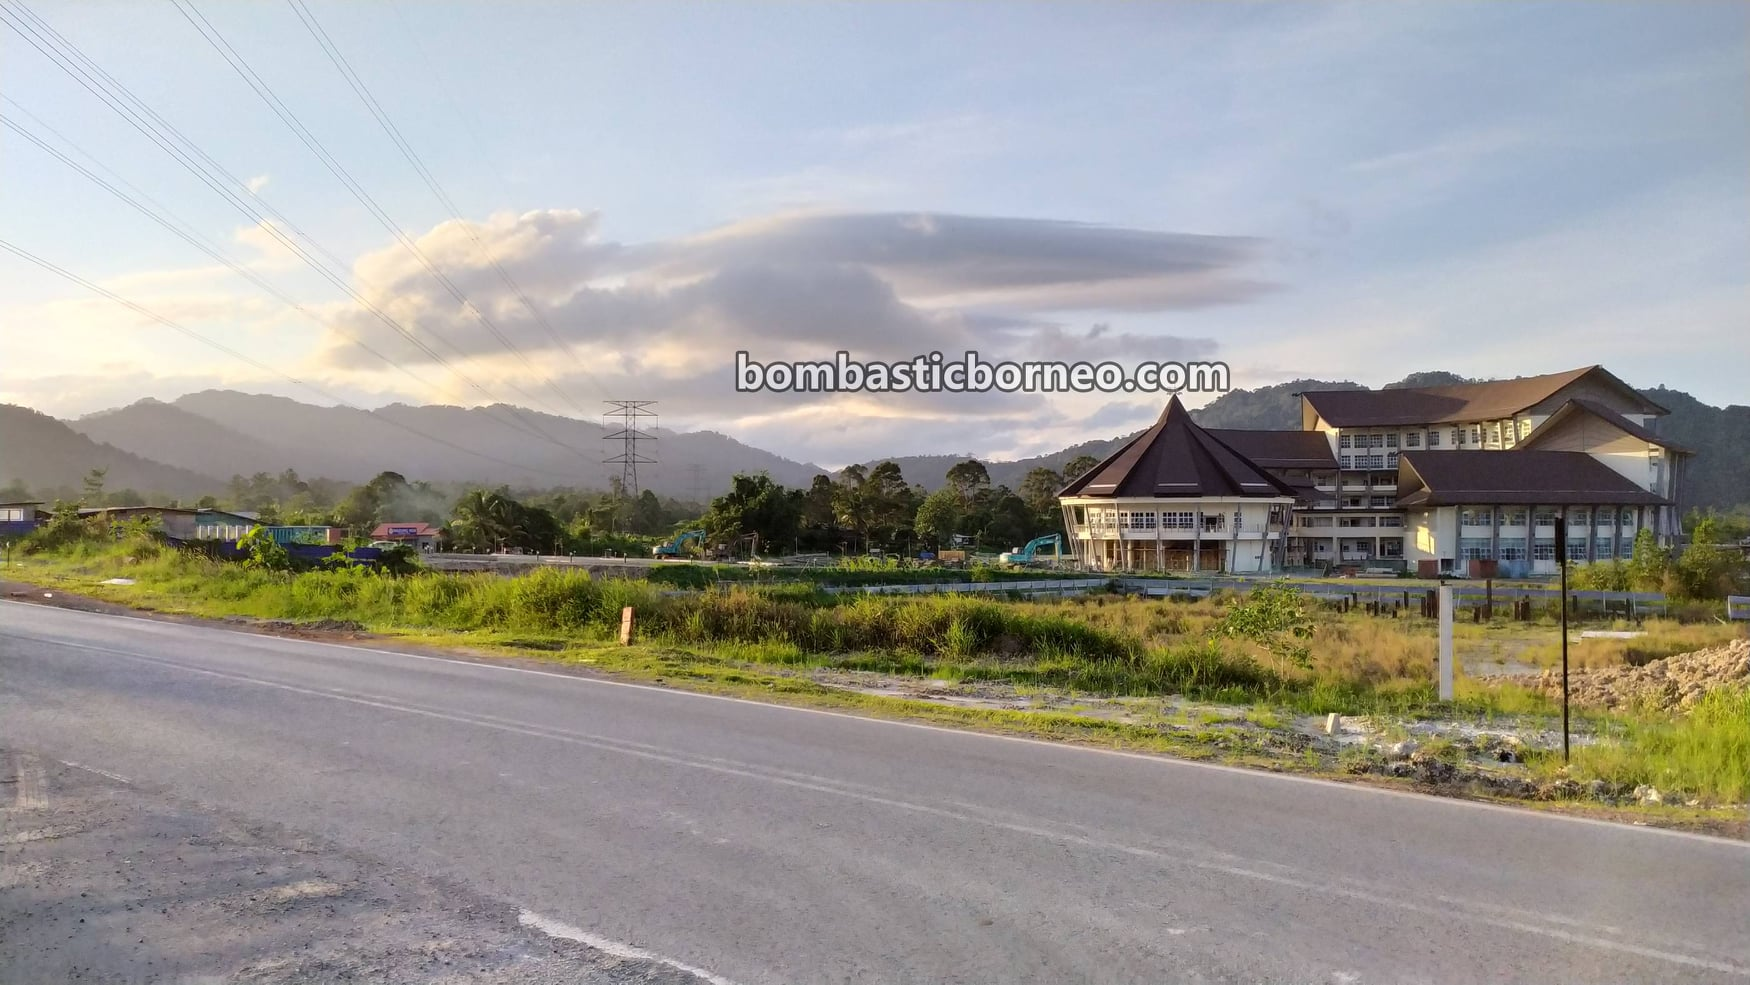 Serian town, backpackers, destination, exploration, objek wisata, Tourism, tourist attraction, travel locally, Trans Borneo, 穿越婆罗洲游踪, 马来西亚砂拉越,, 西连镇,